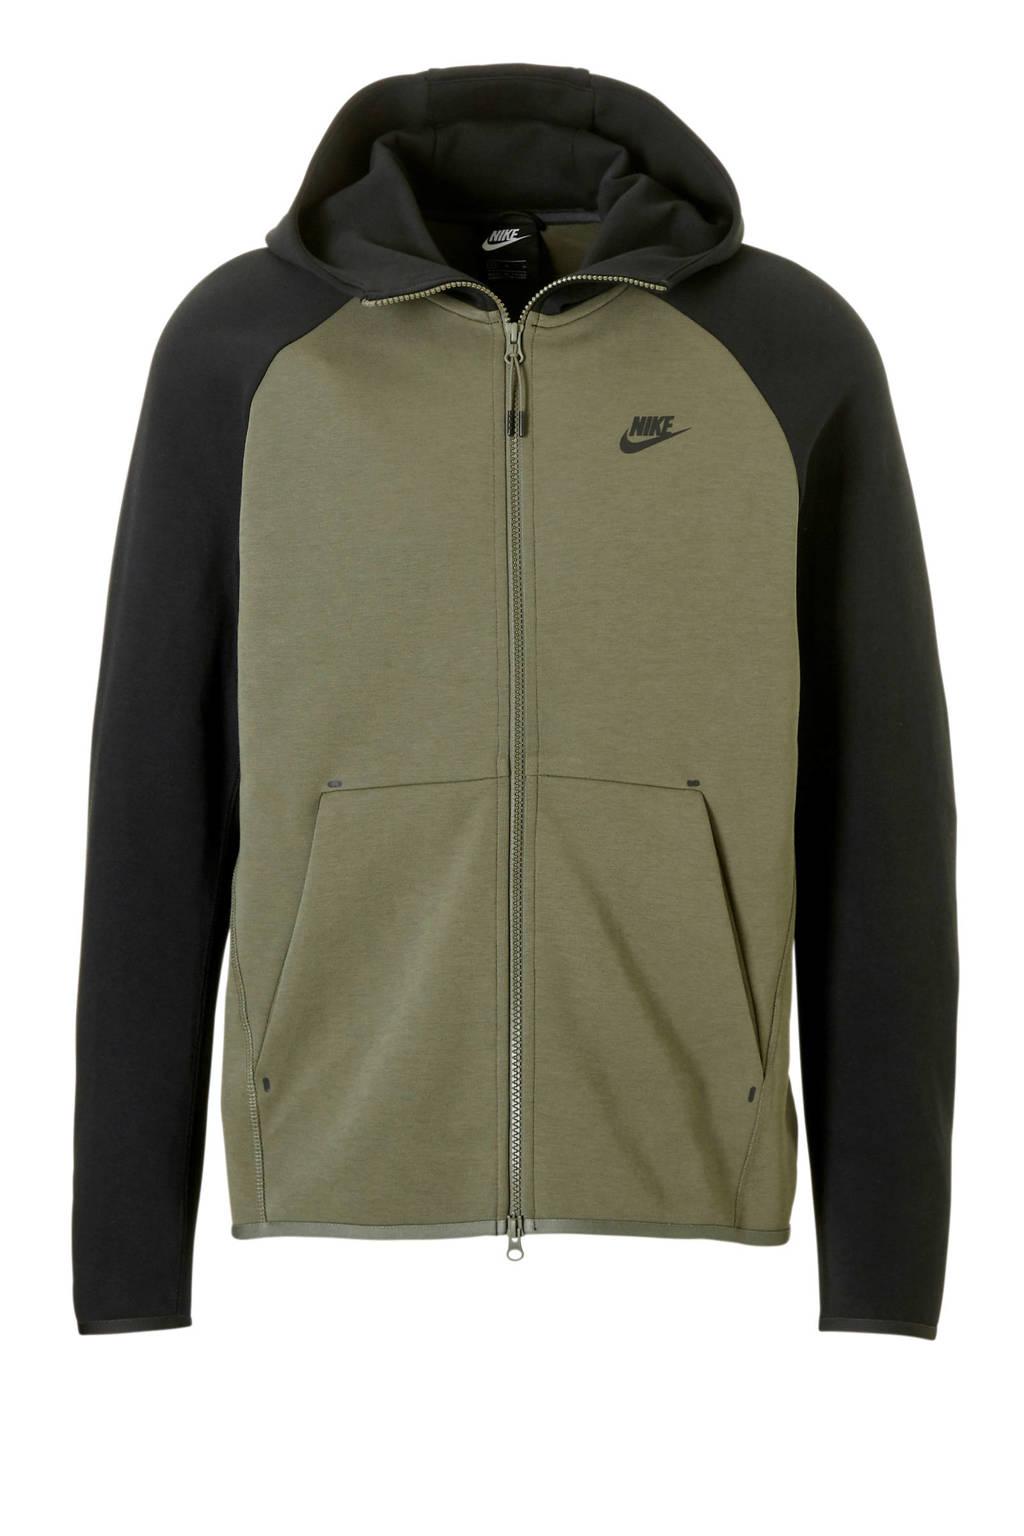 Nike Tech Fleece vest, Groen/zwart